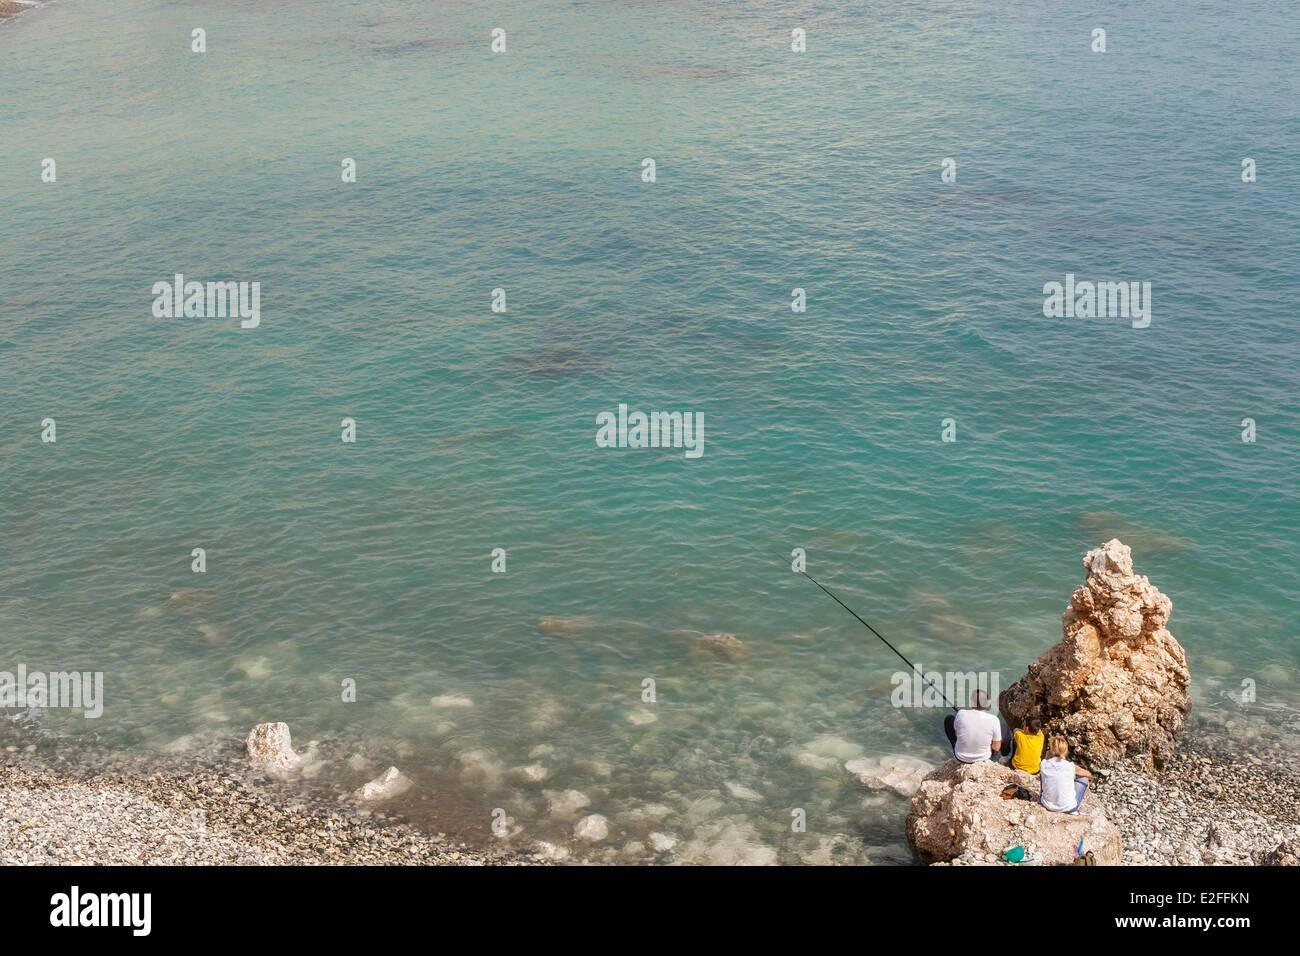 Zypern, Paphos Bezirk, Petra Tou Romiou, legendäre Geburtsort der Göttin Aphrodite, Fischer Stockbild